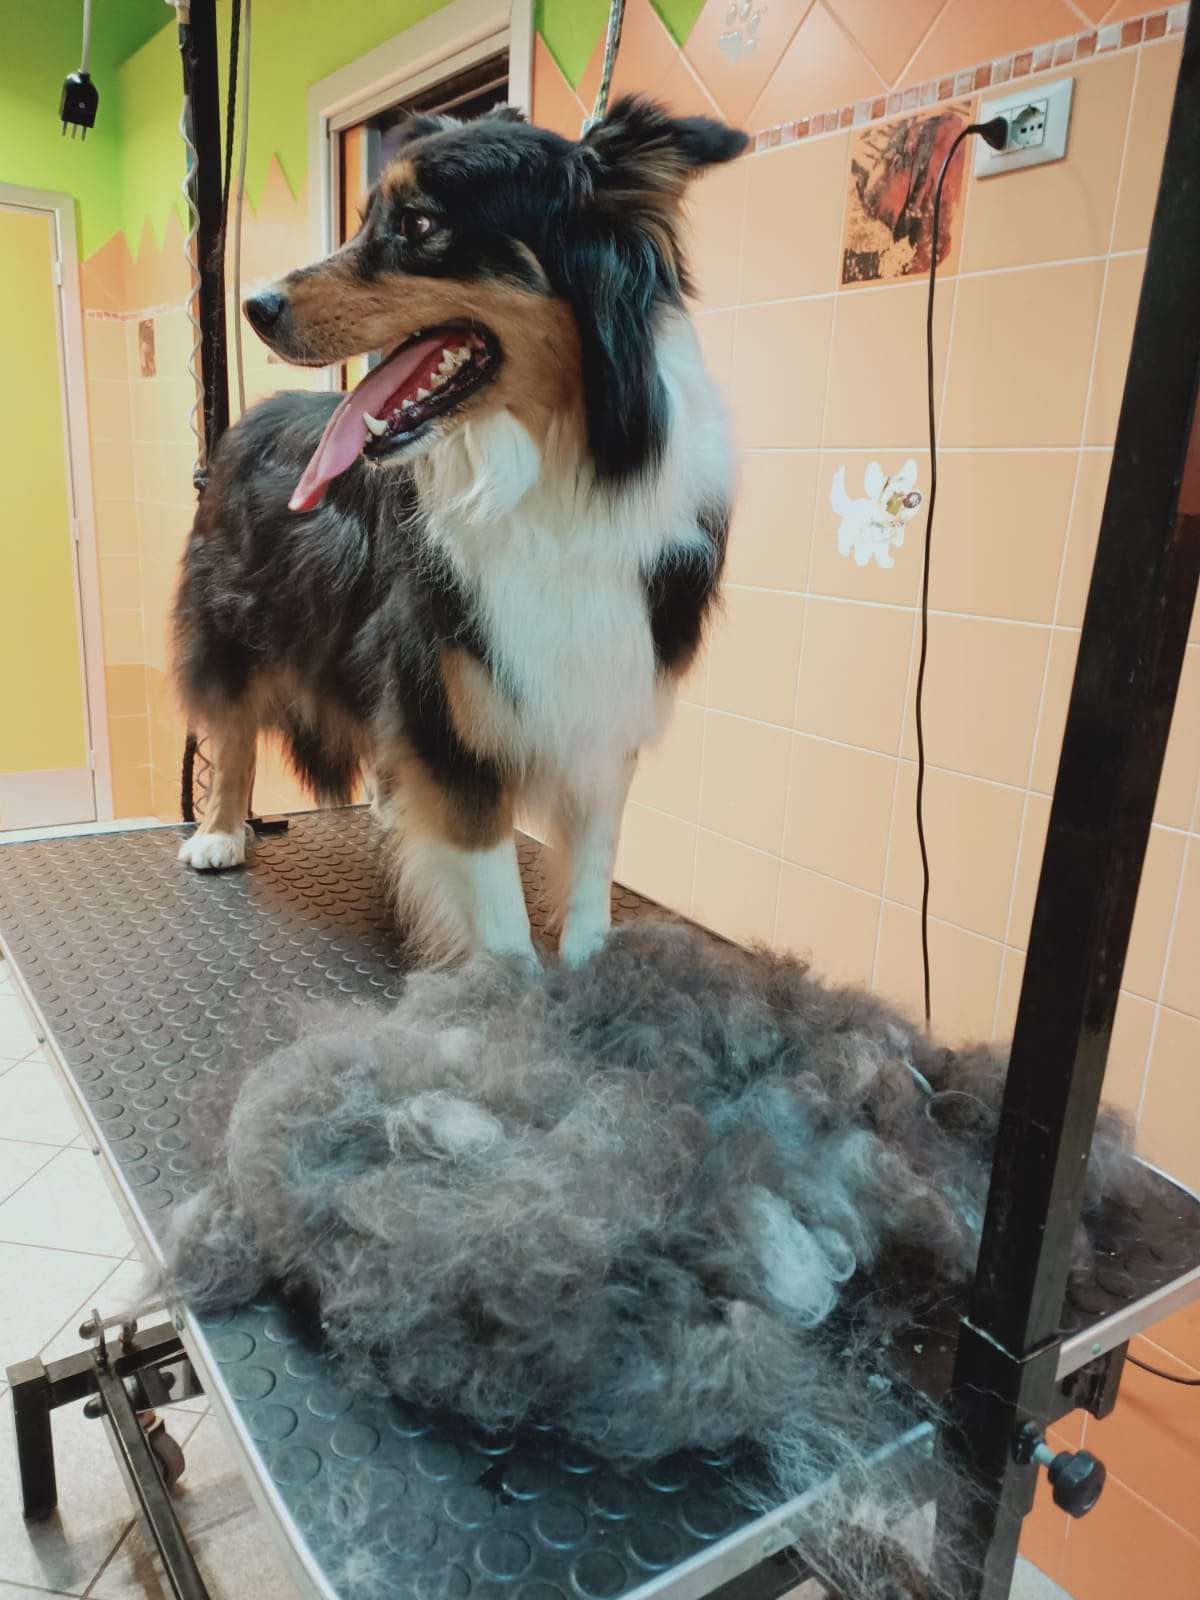 Toelettatura cane medie dimensioni